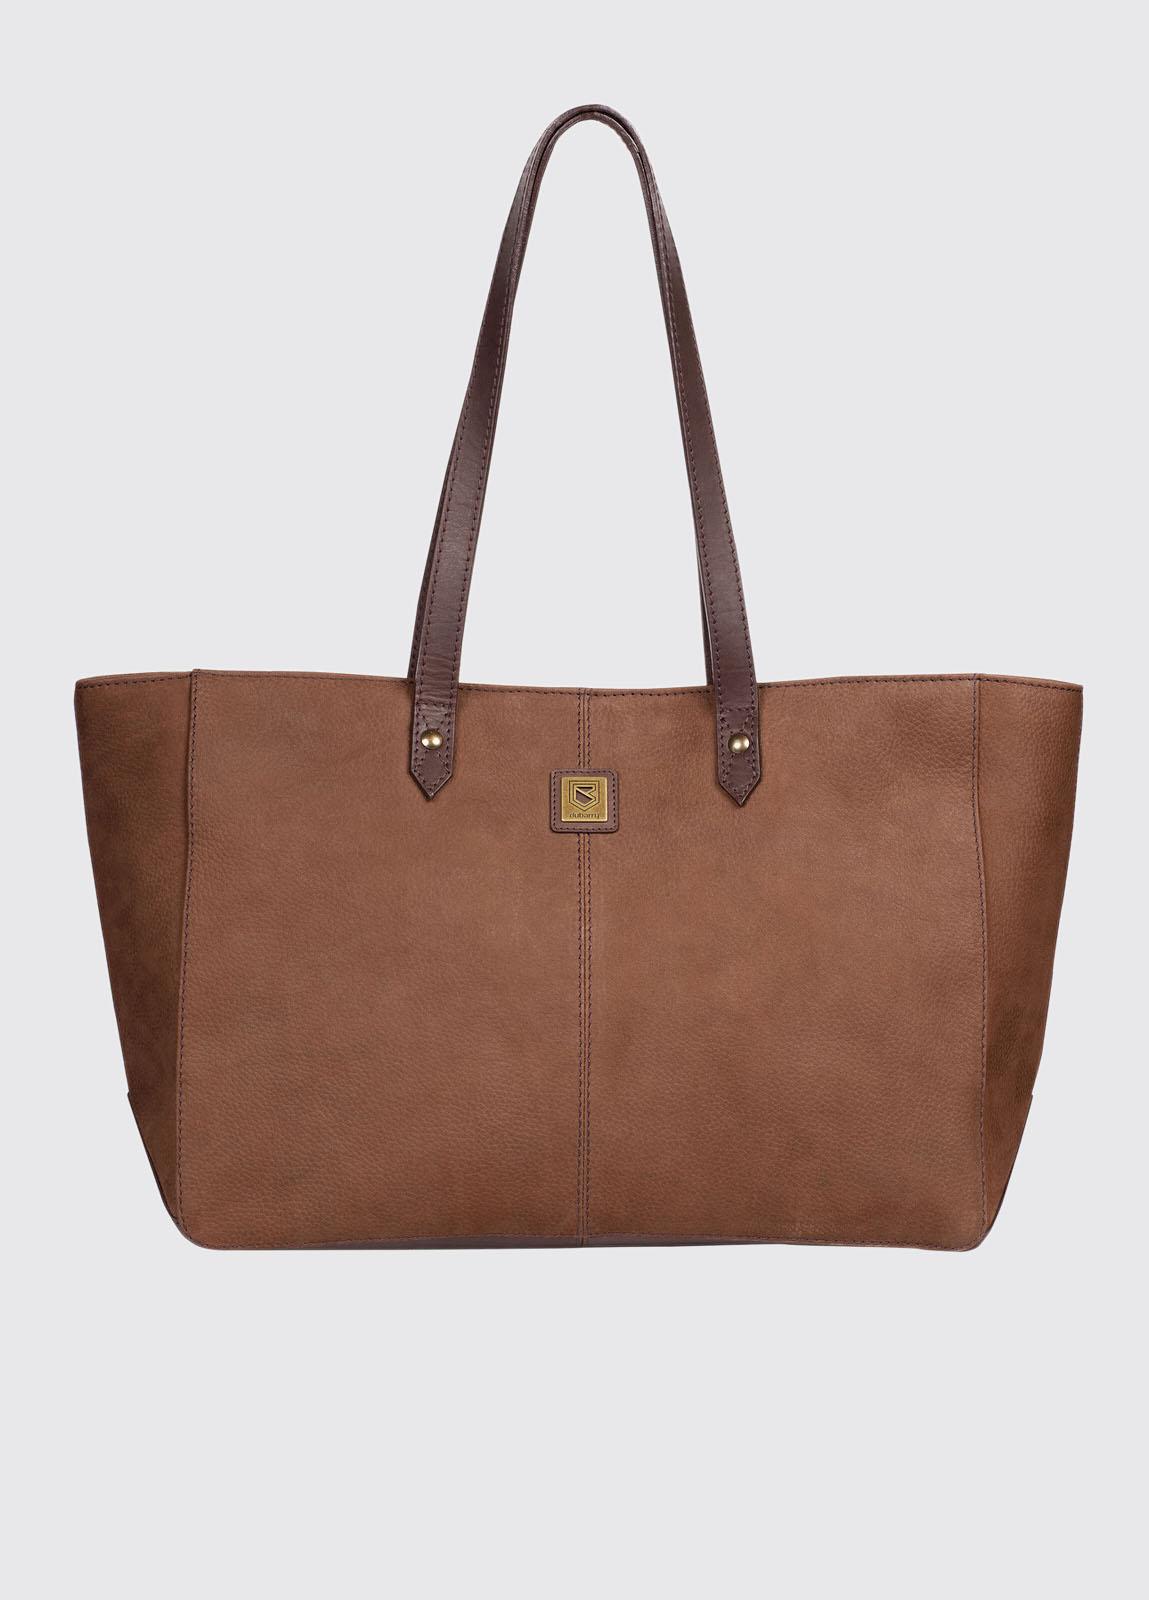 Baltinglass Tote Bag - Walnut